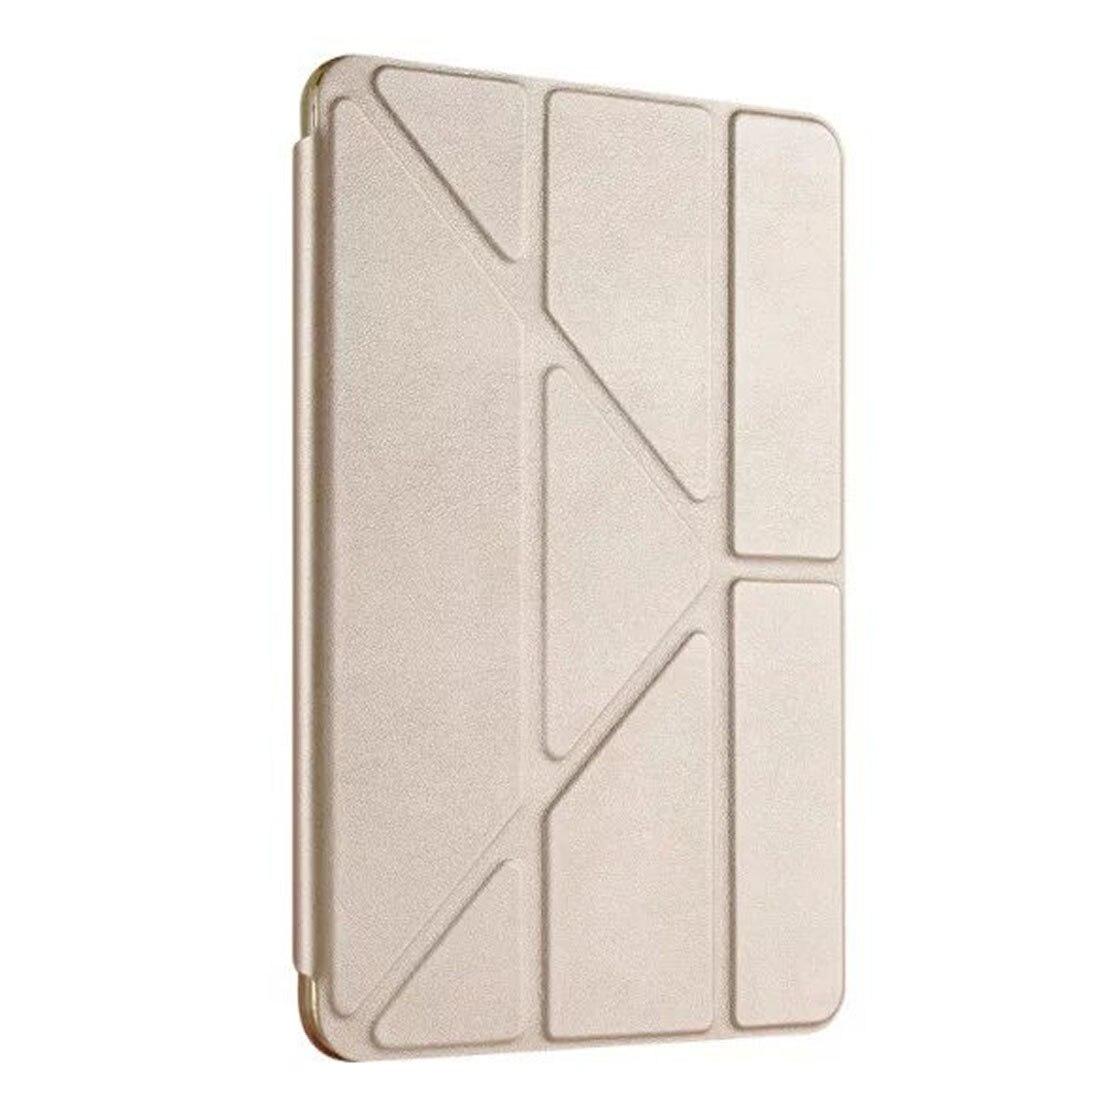 Etmakit Quality Ultra Thin Stand Design TPU Soft case For ipad mini 3 2 1 Cover Colorful Flip Smart Cover Smart Table Case cover aqua pa ultra soft match 100m 0 18mm 3 60kg